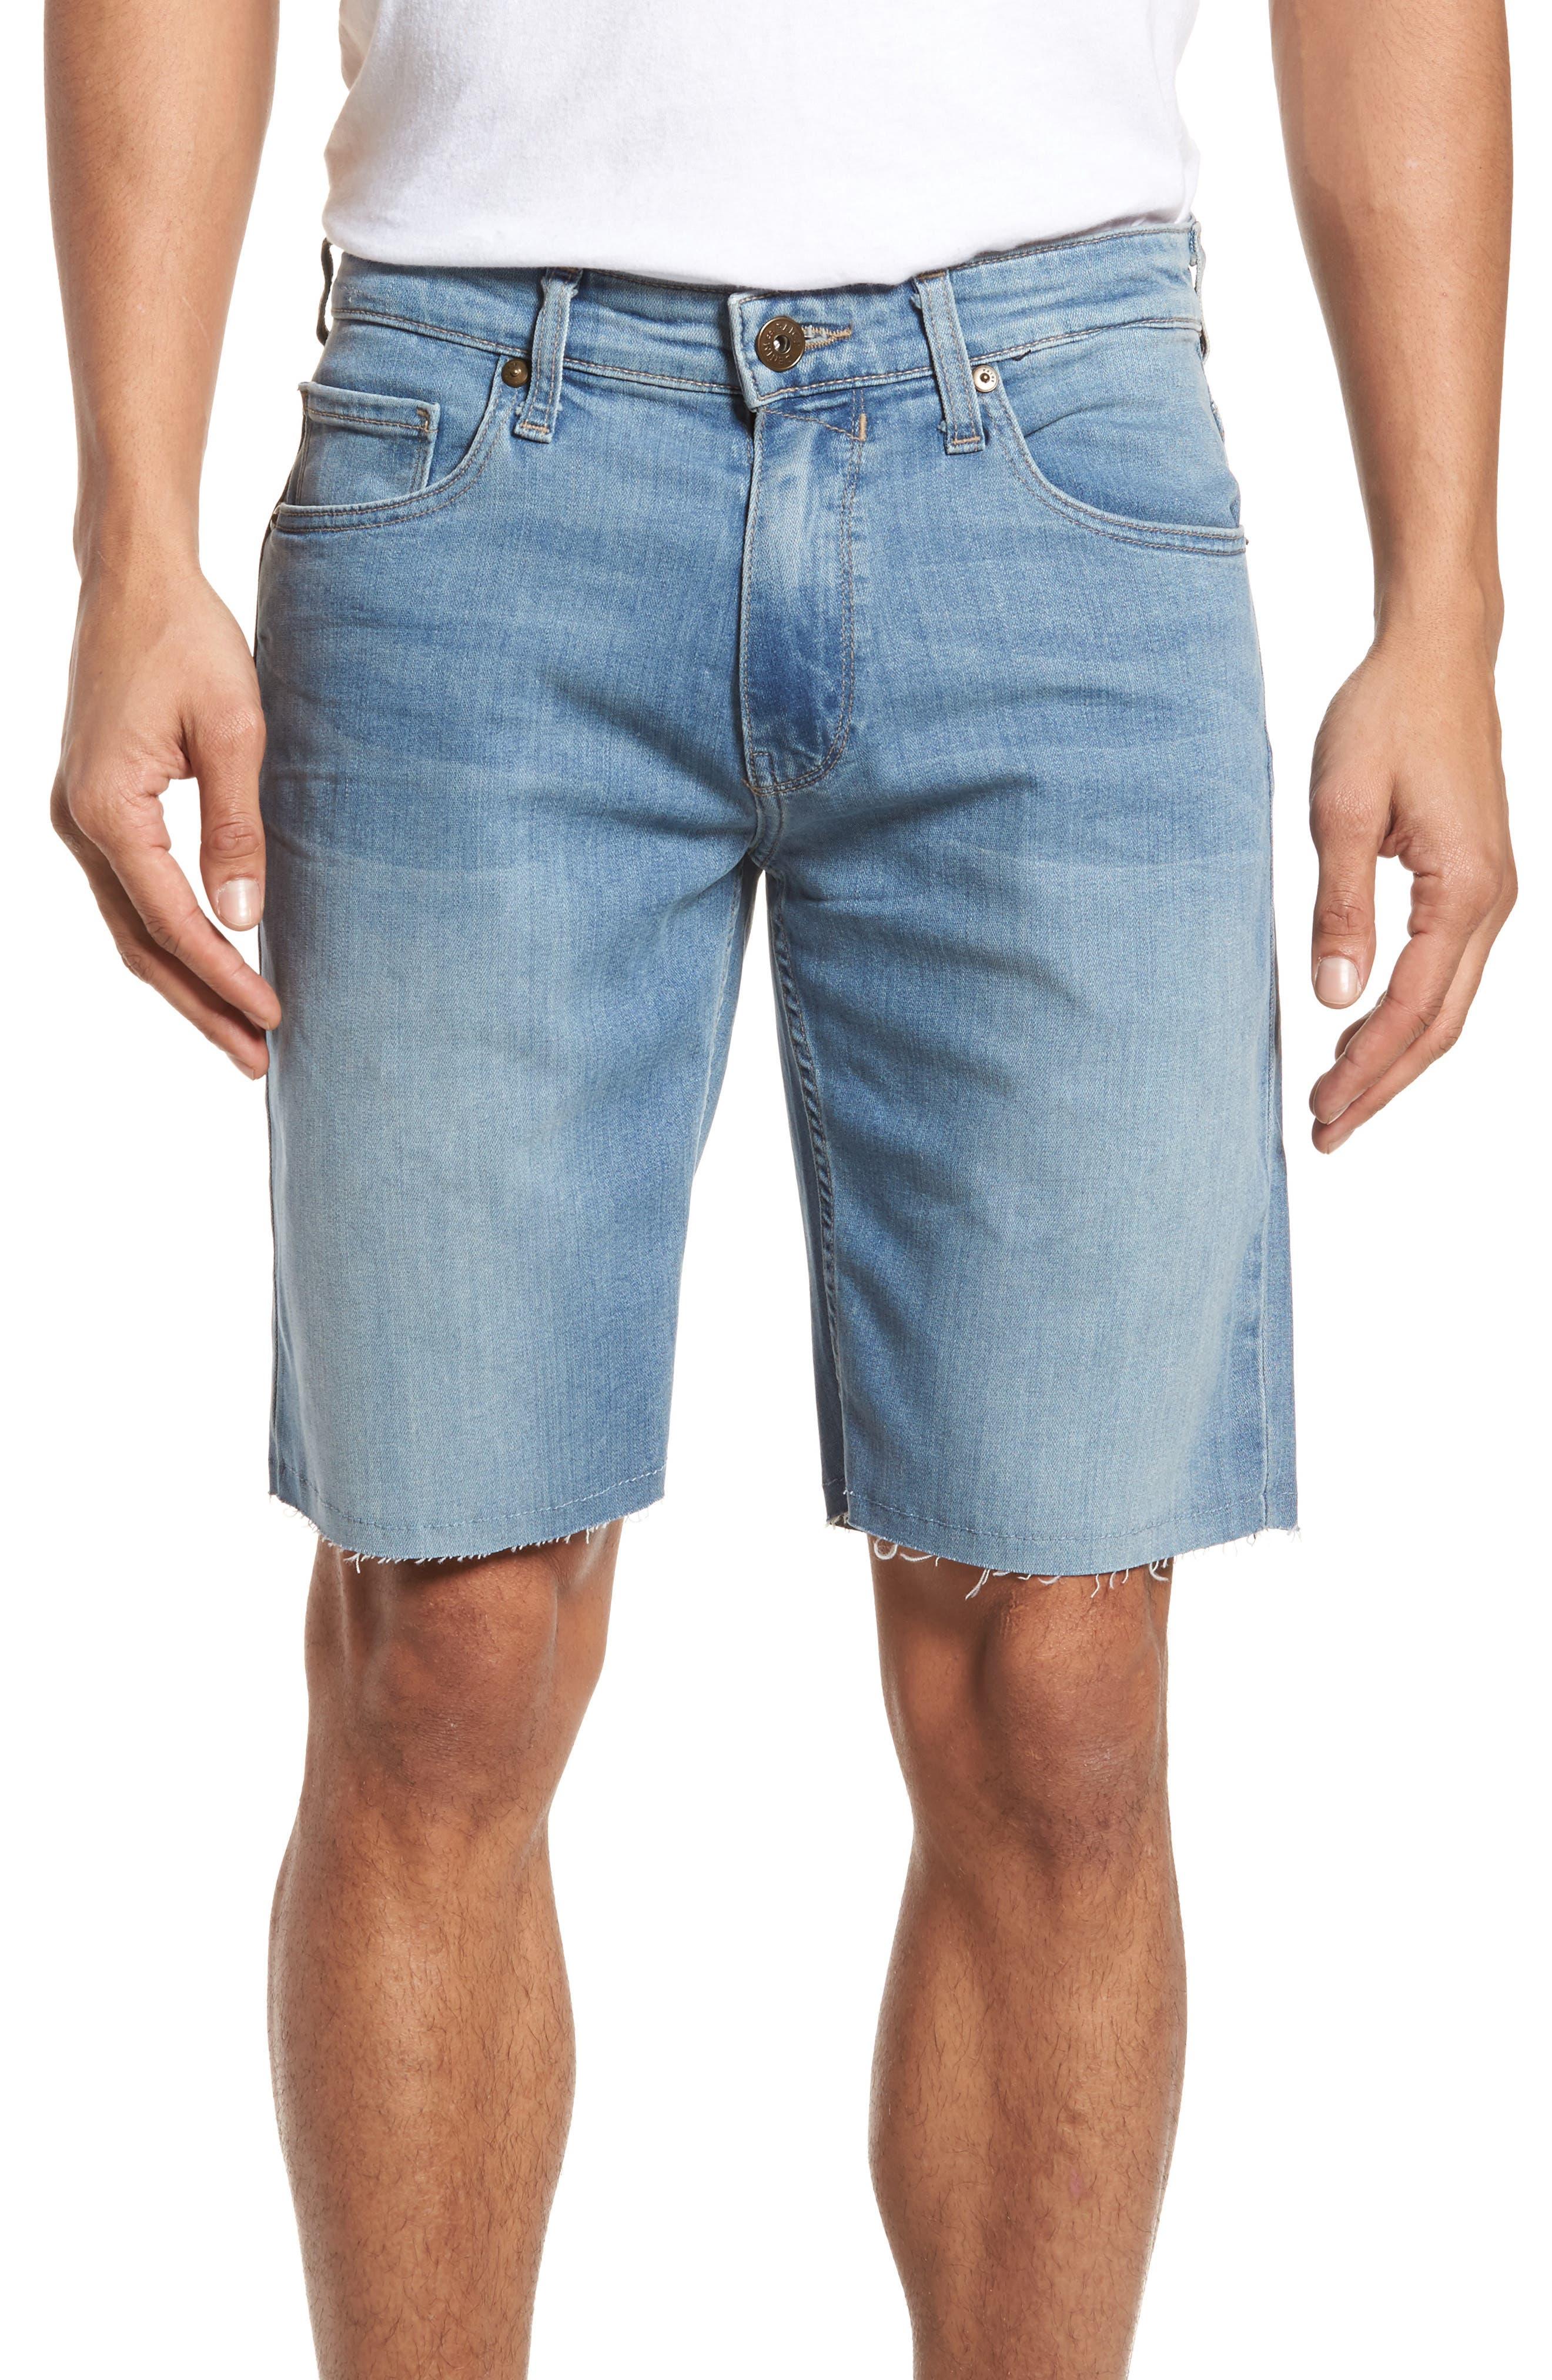 Transcend - Federal Slim Straight Leg Denim Shorts,                         Main,                         color, 400